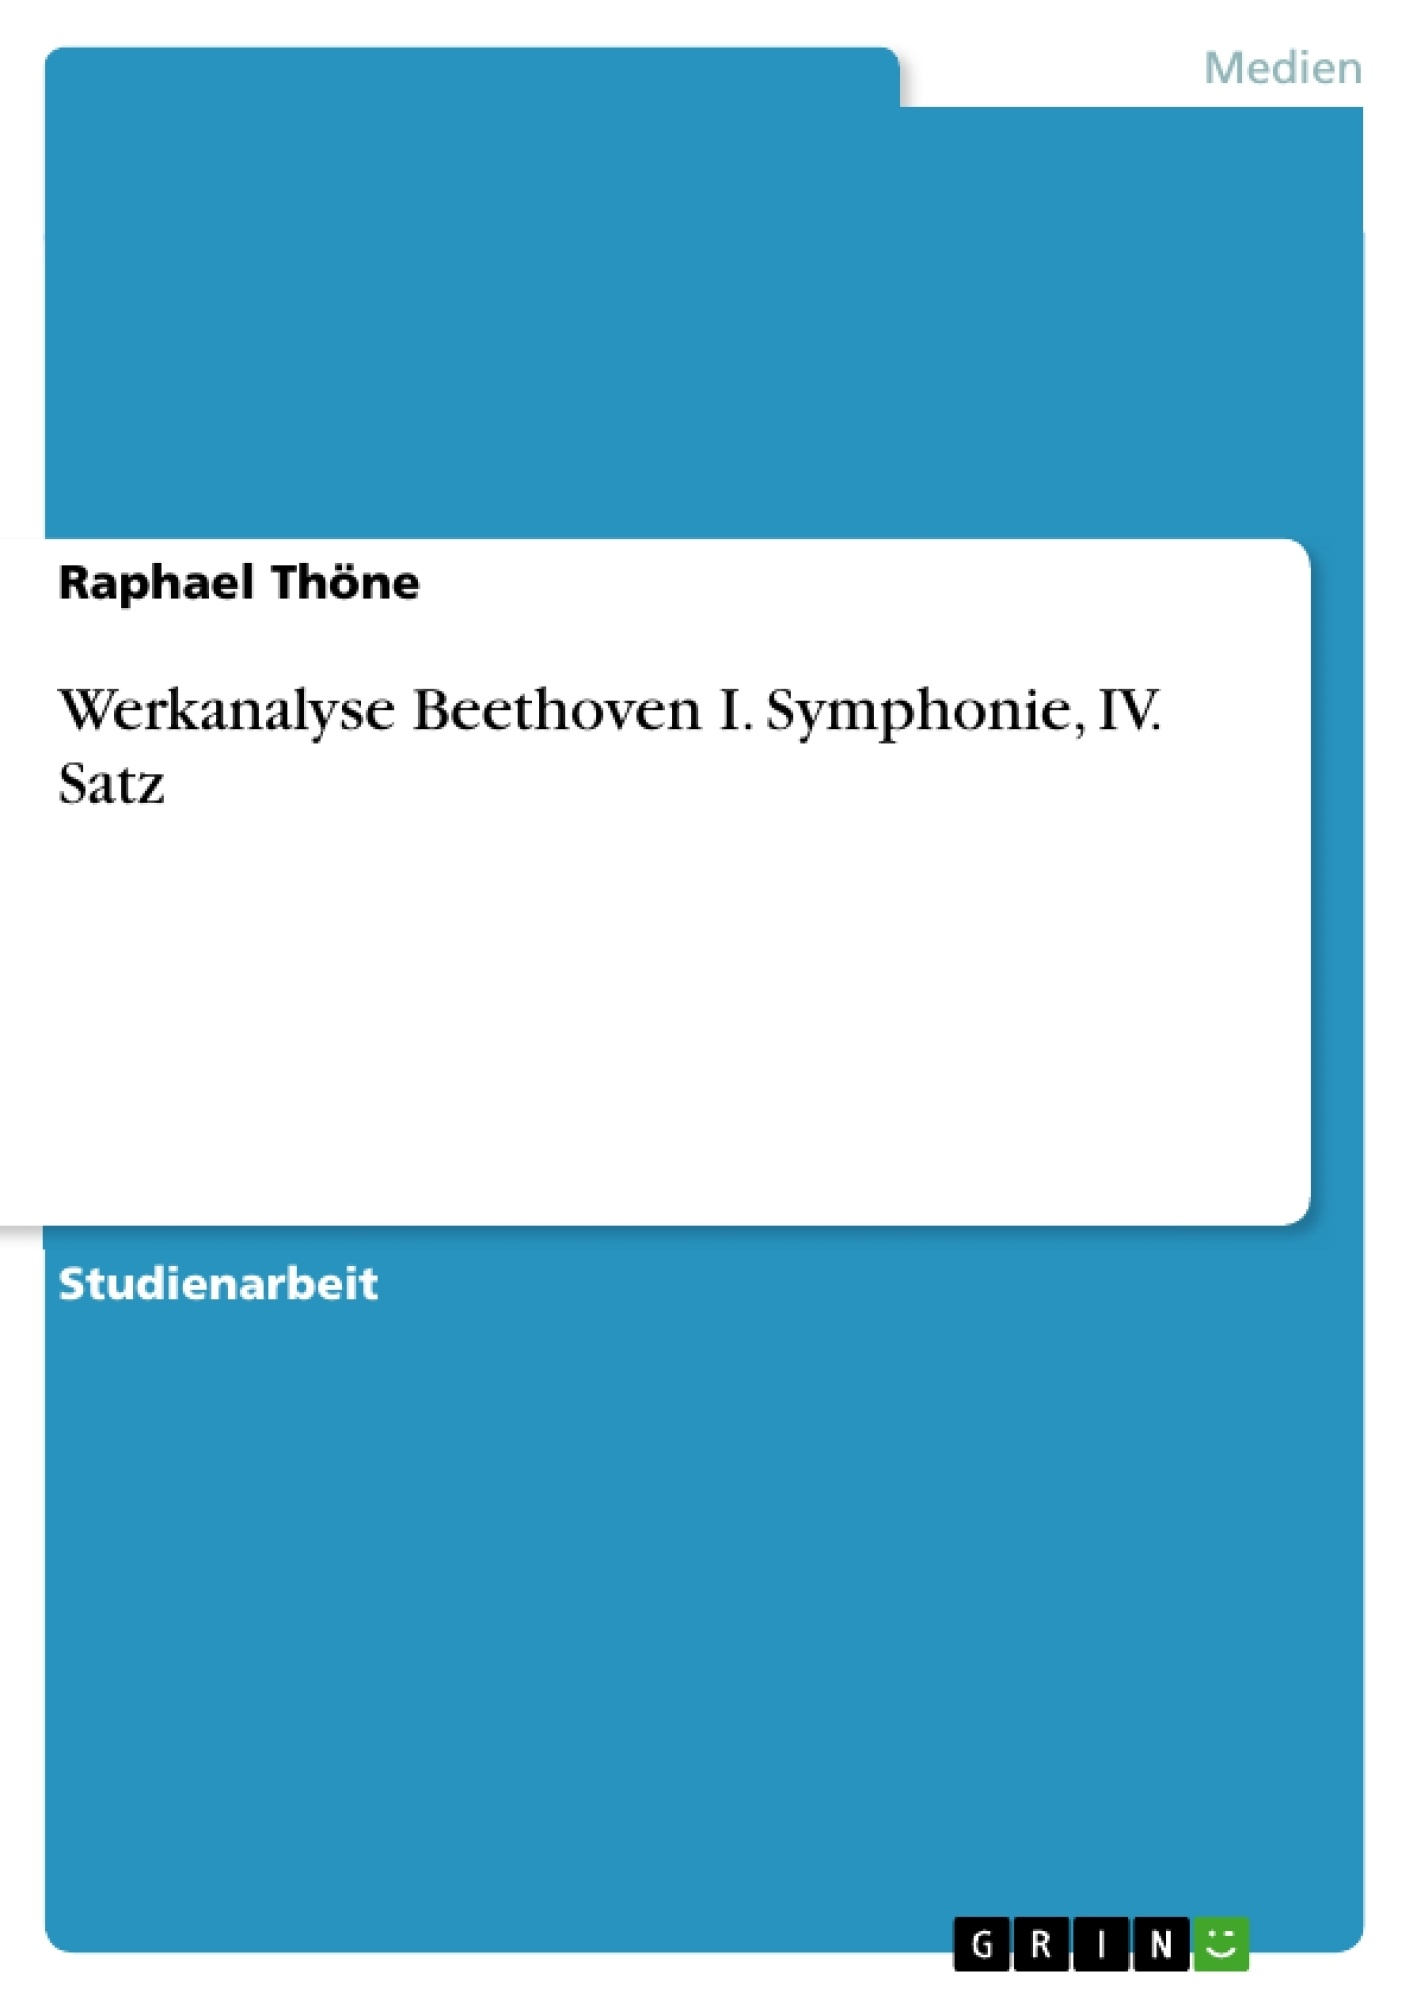 Titel: Werkanalyse Beethoven I. Symphonie, IV. Satz